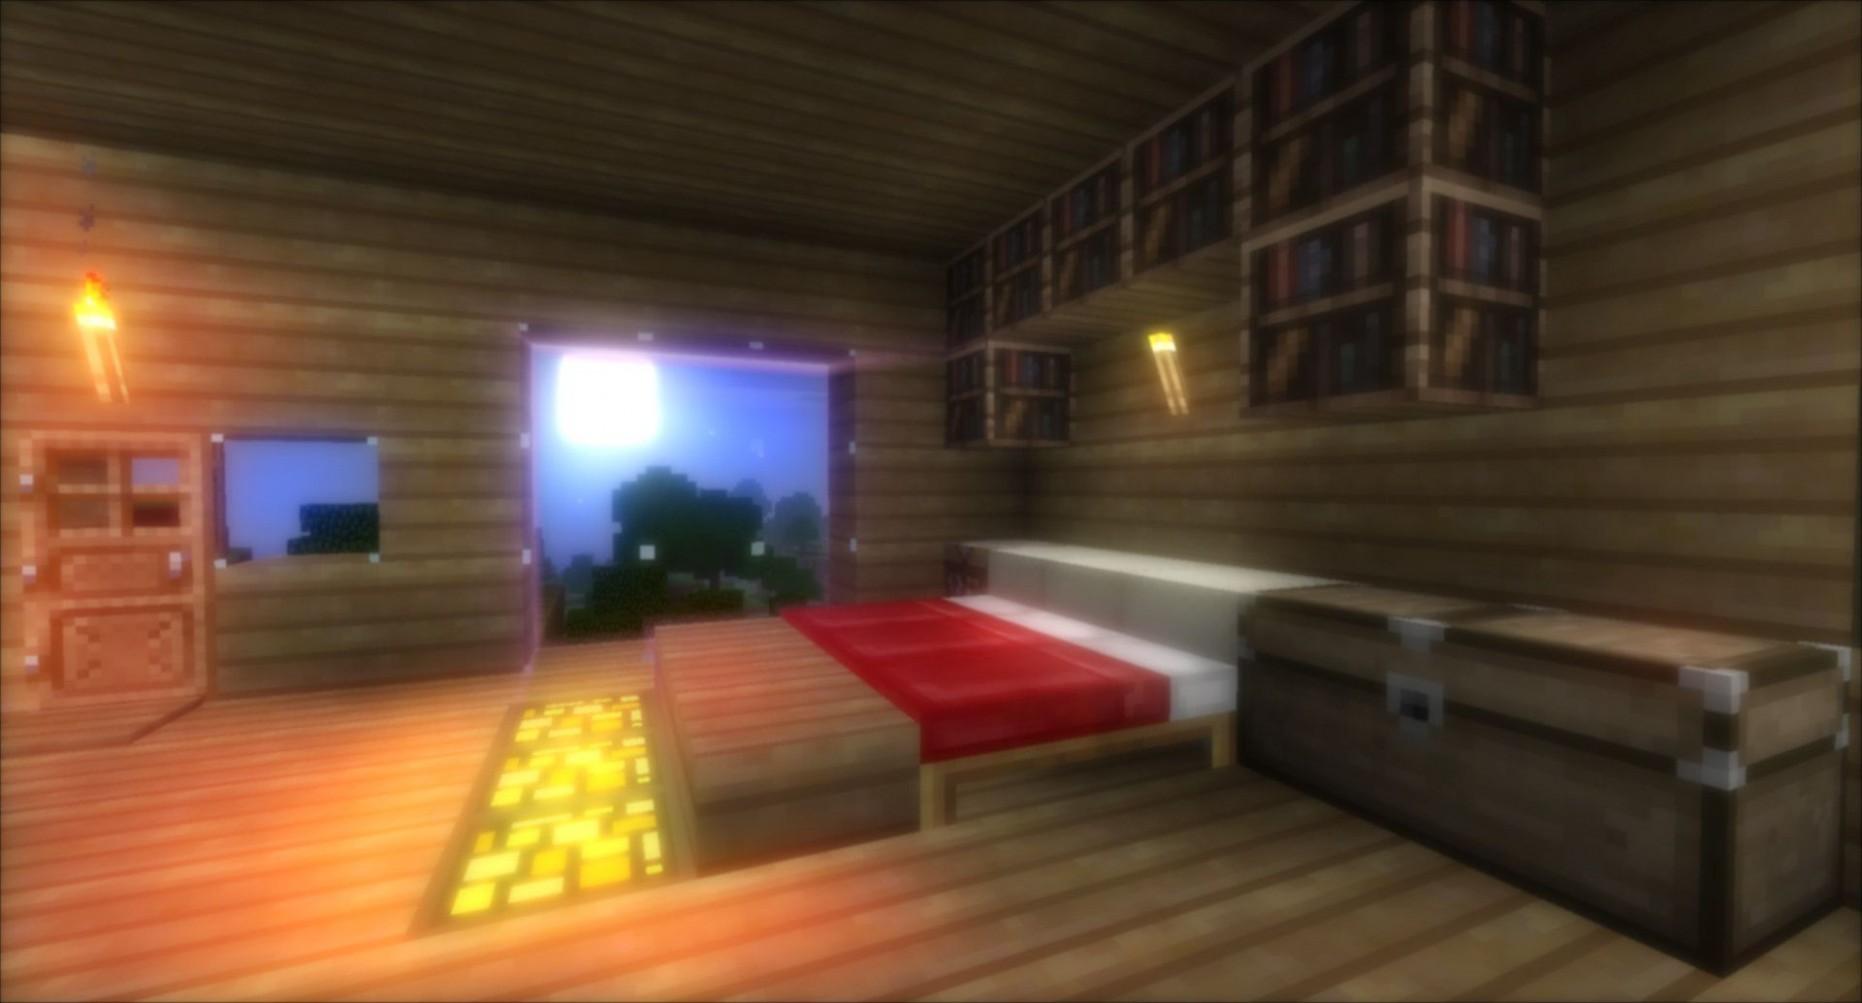 Minecraft room décor  Minecraft interior design, Minecraft house  - Bedroom Ideas In Minecraft